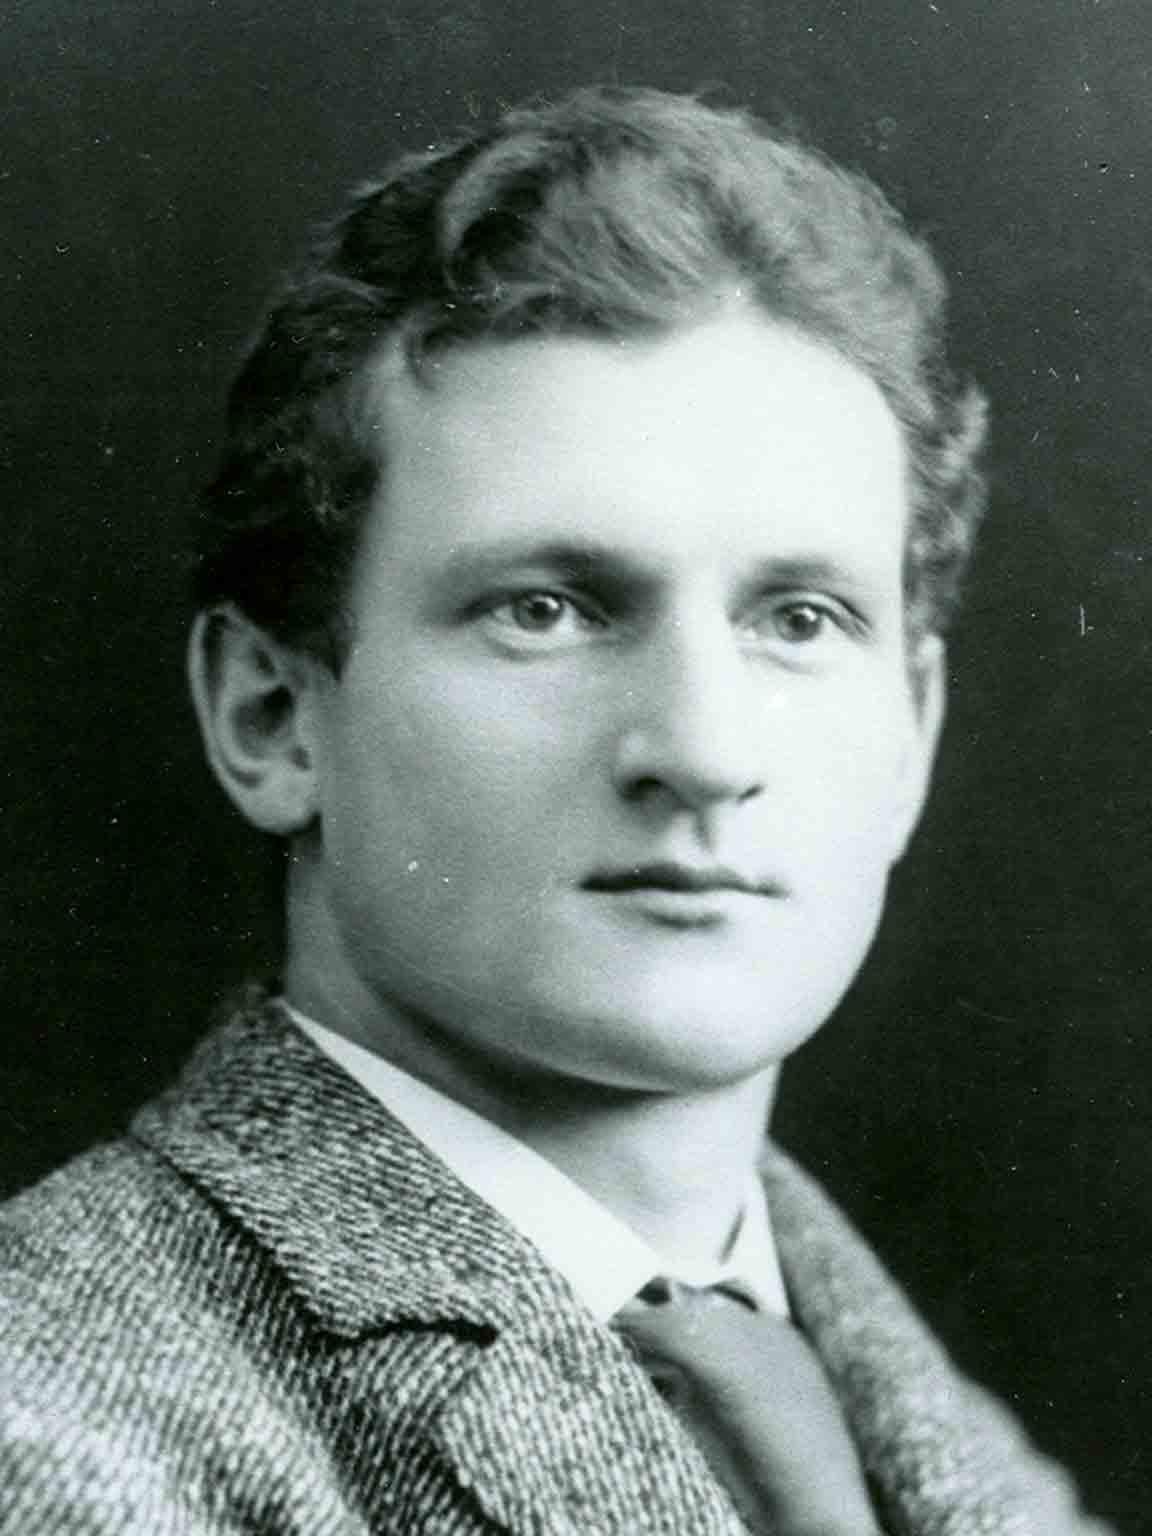 Edward Maxwell